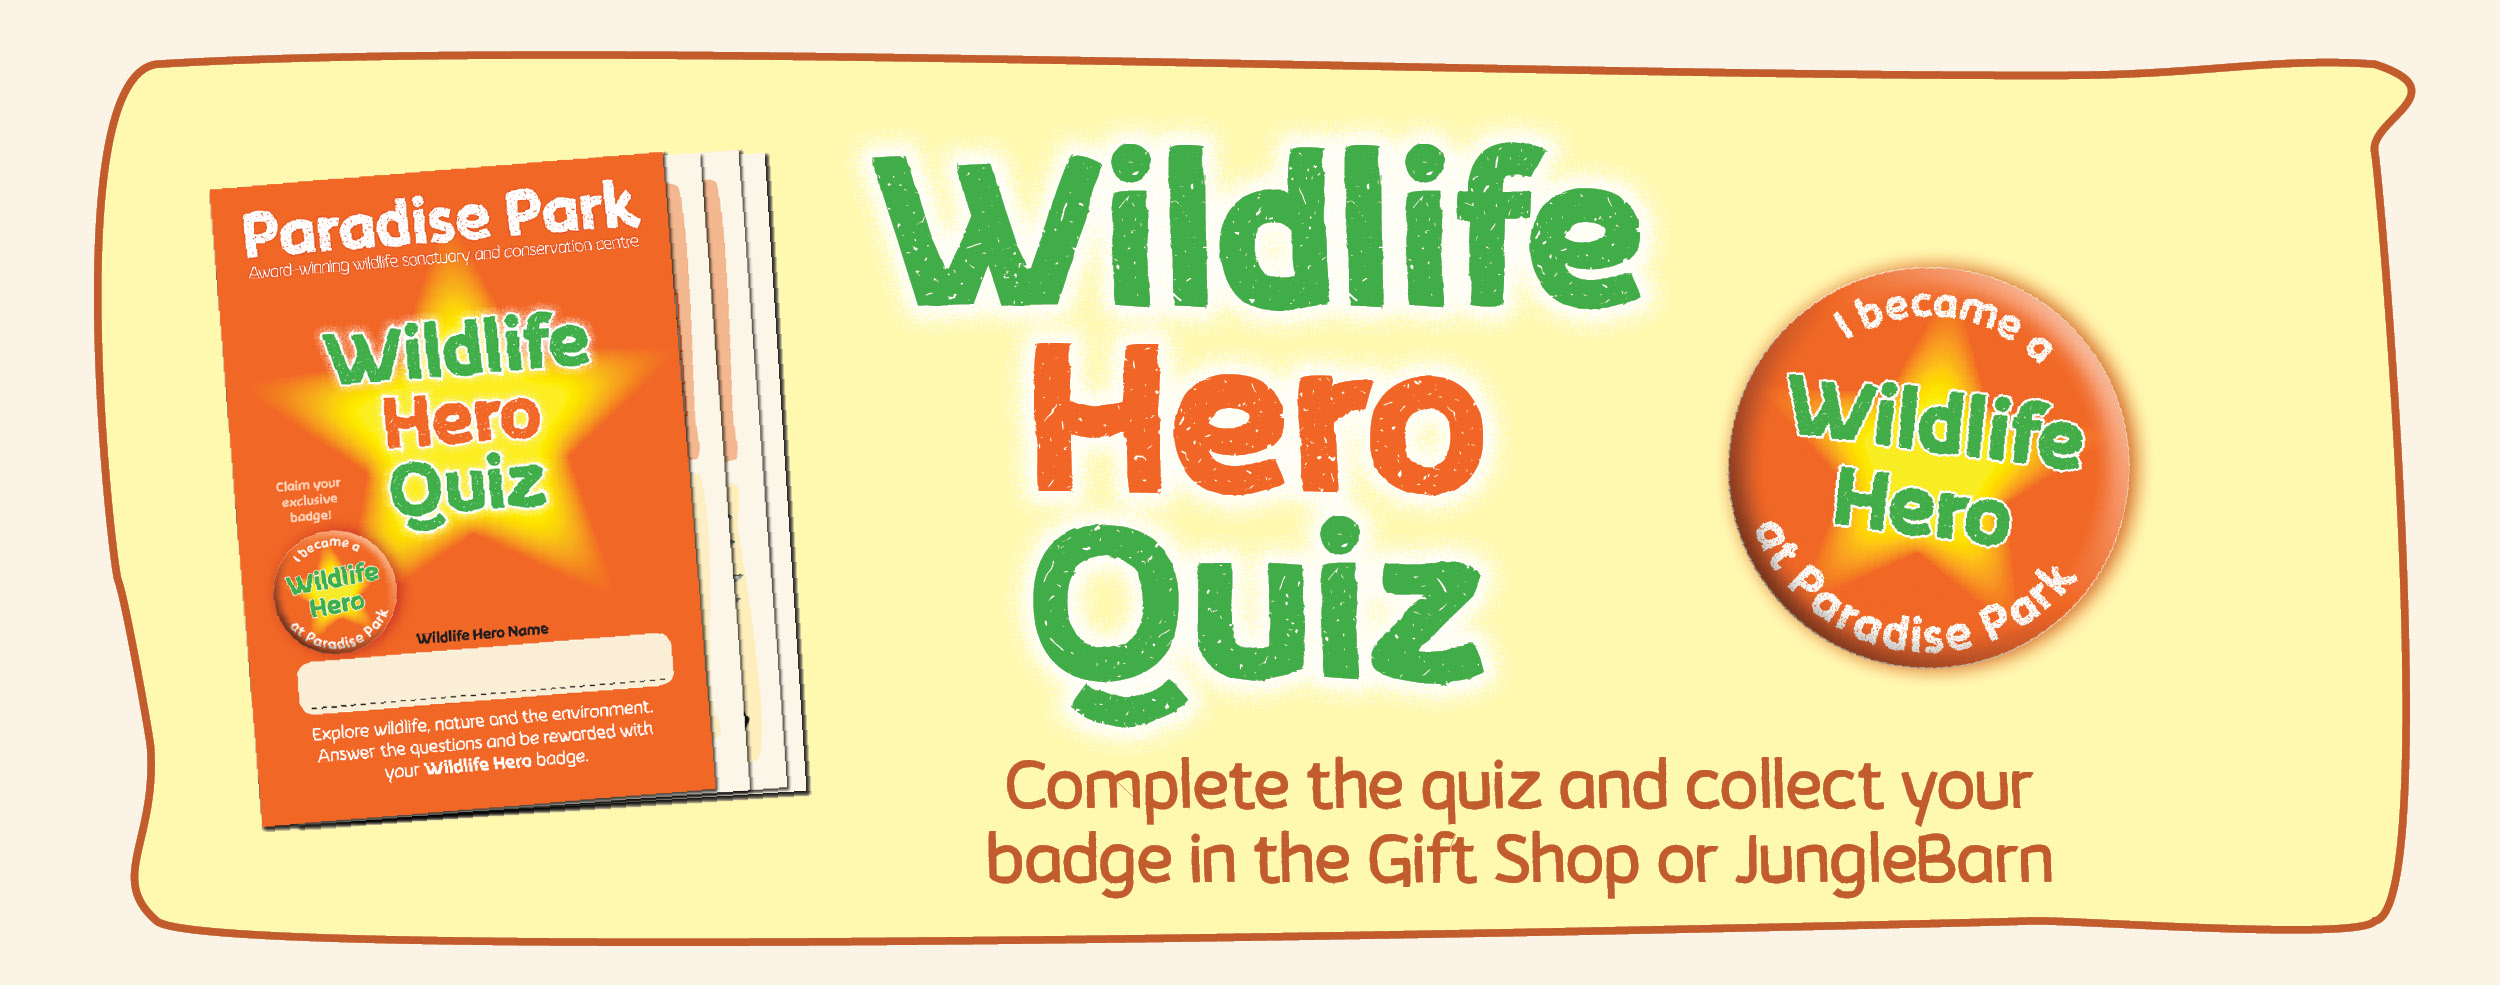 Wildlife Hero Quiz - Paradise Park